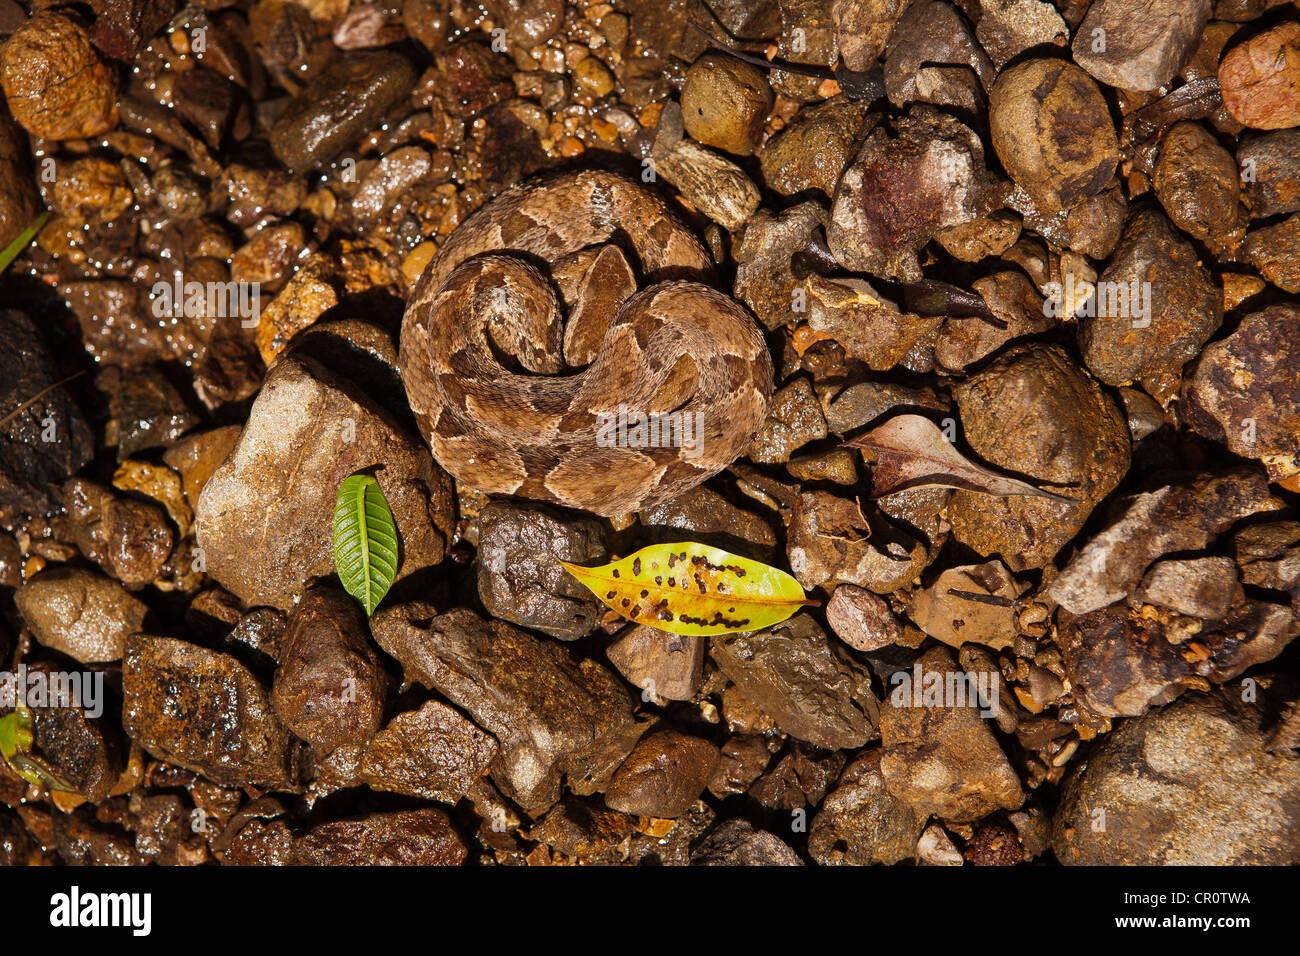 The dangerous venomous snake Common Lancehead (Fer-de-Lance), sci. name; Bothrops asper, Republic of Panama - Stock Image